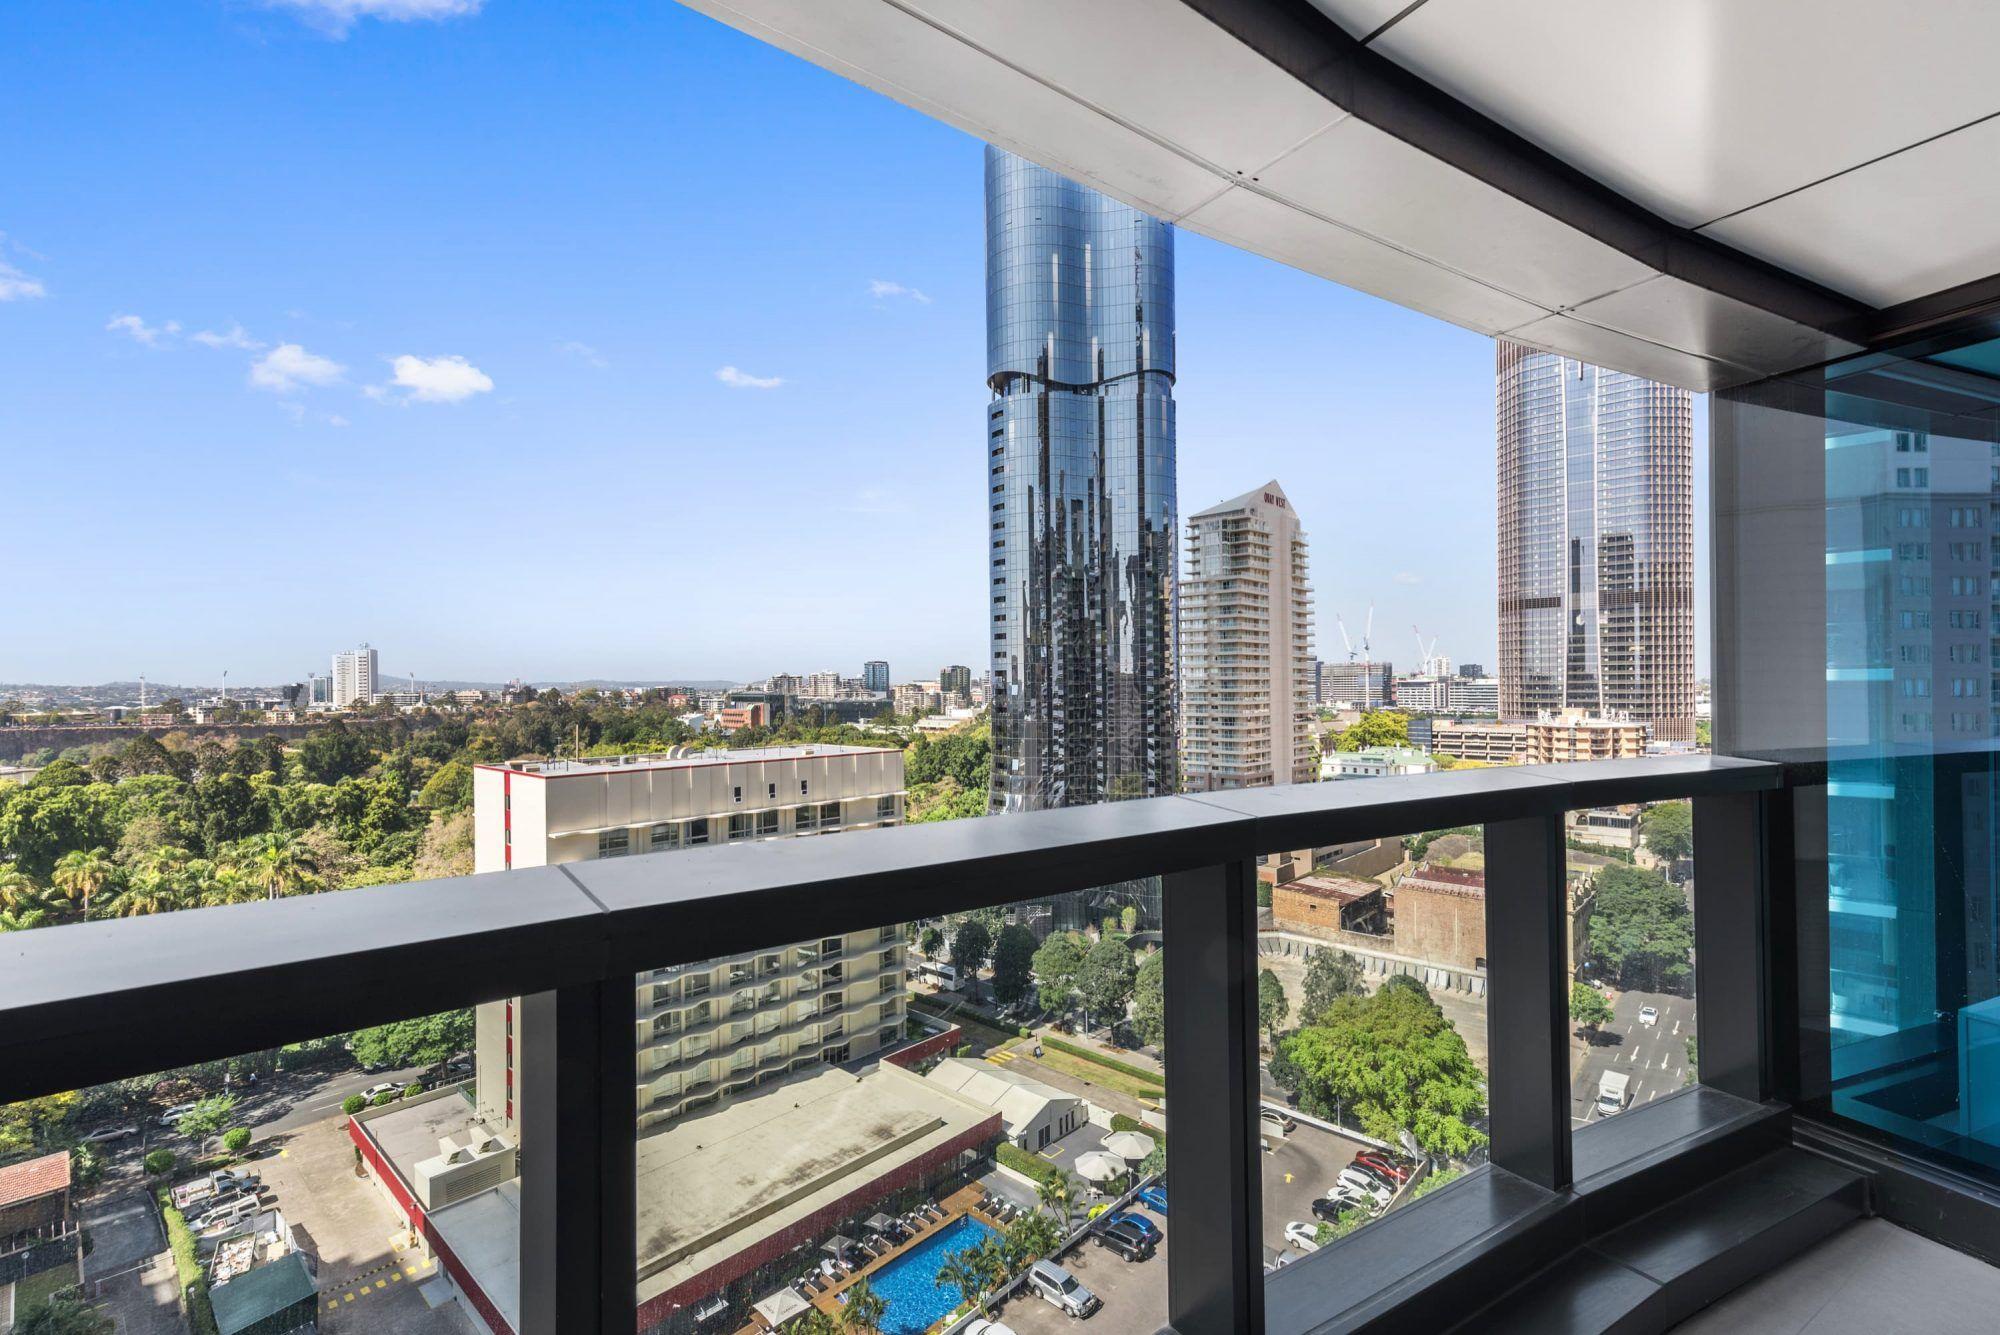 2 Bedroom 1 Bathroom Apartments For Rent In Brisbane City